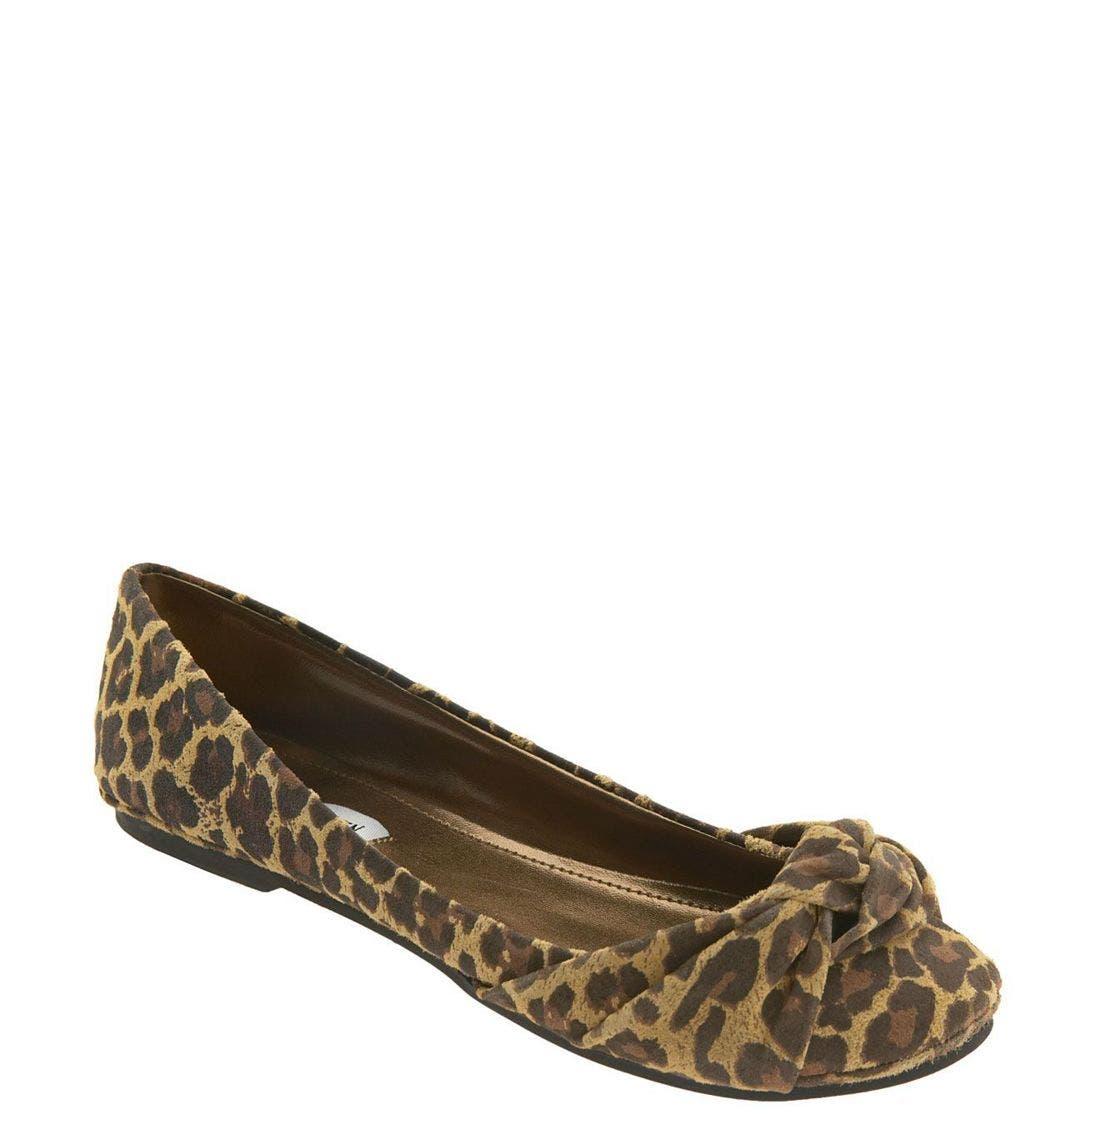 'Crunchh' Flat,                         Main,                         color, Leopard